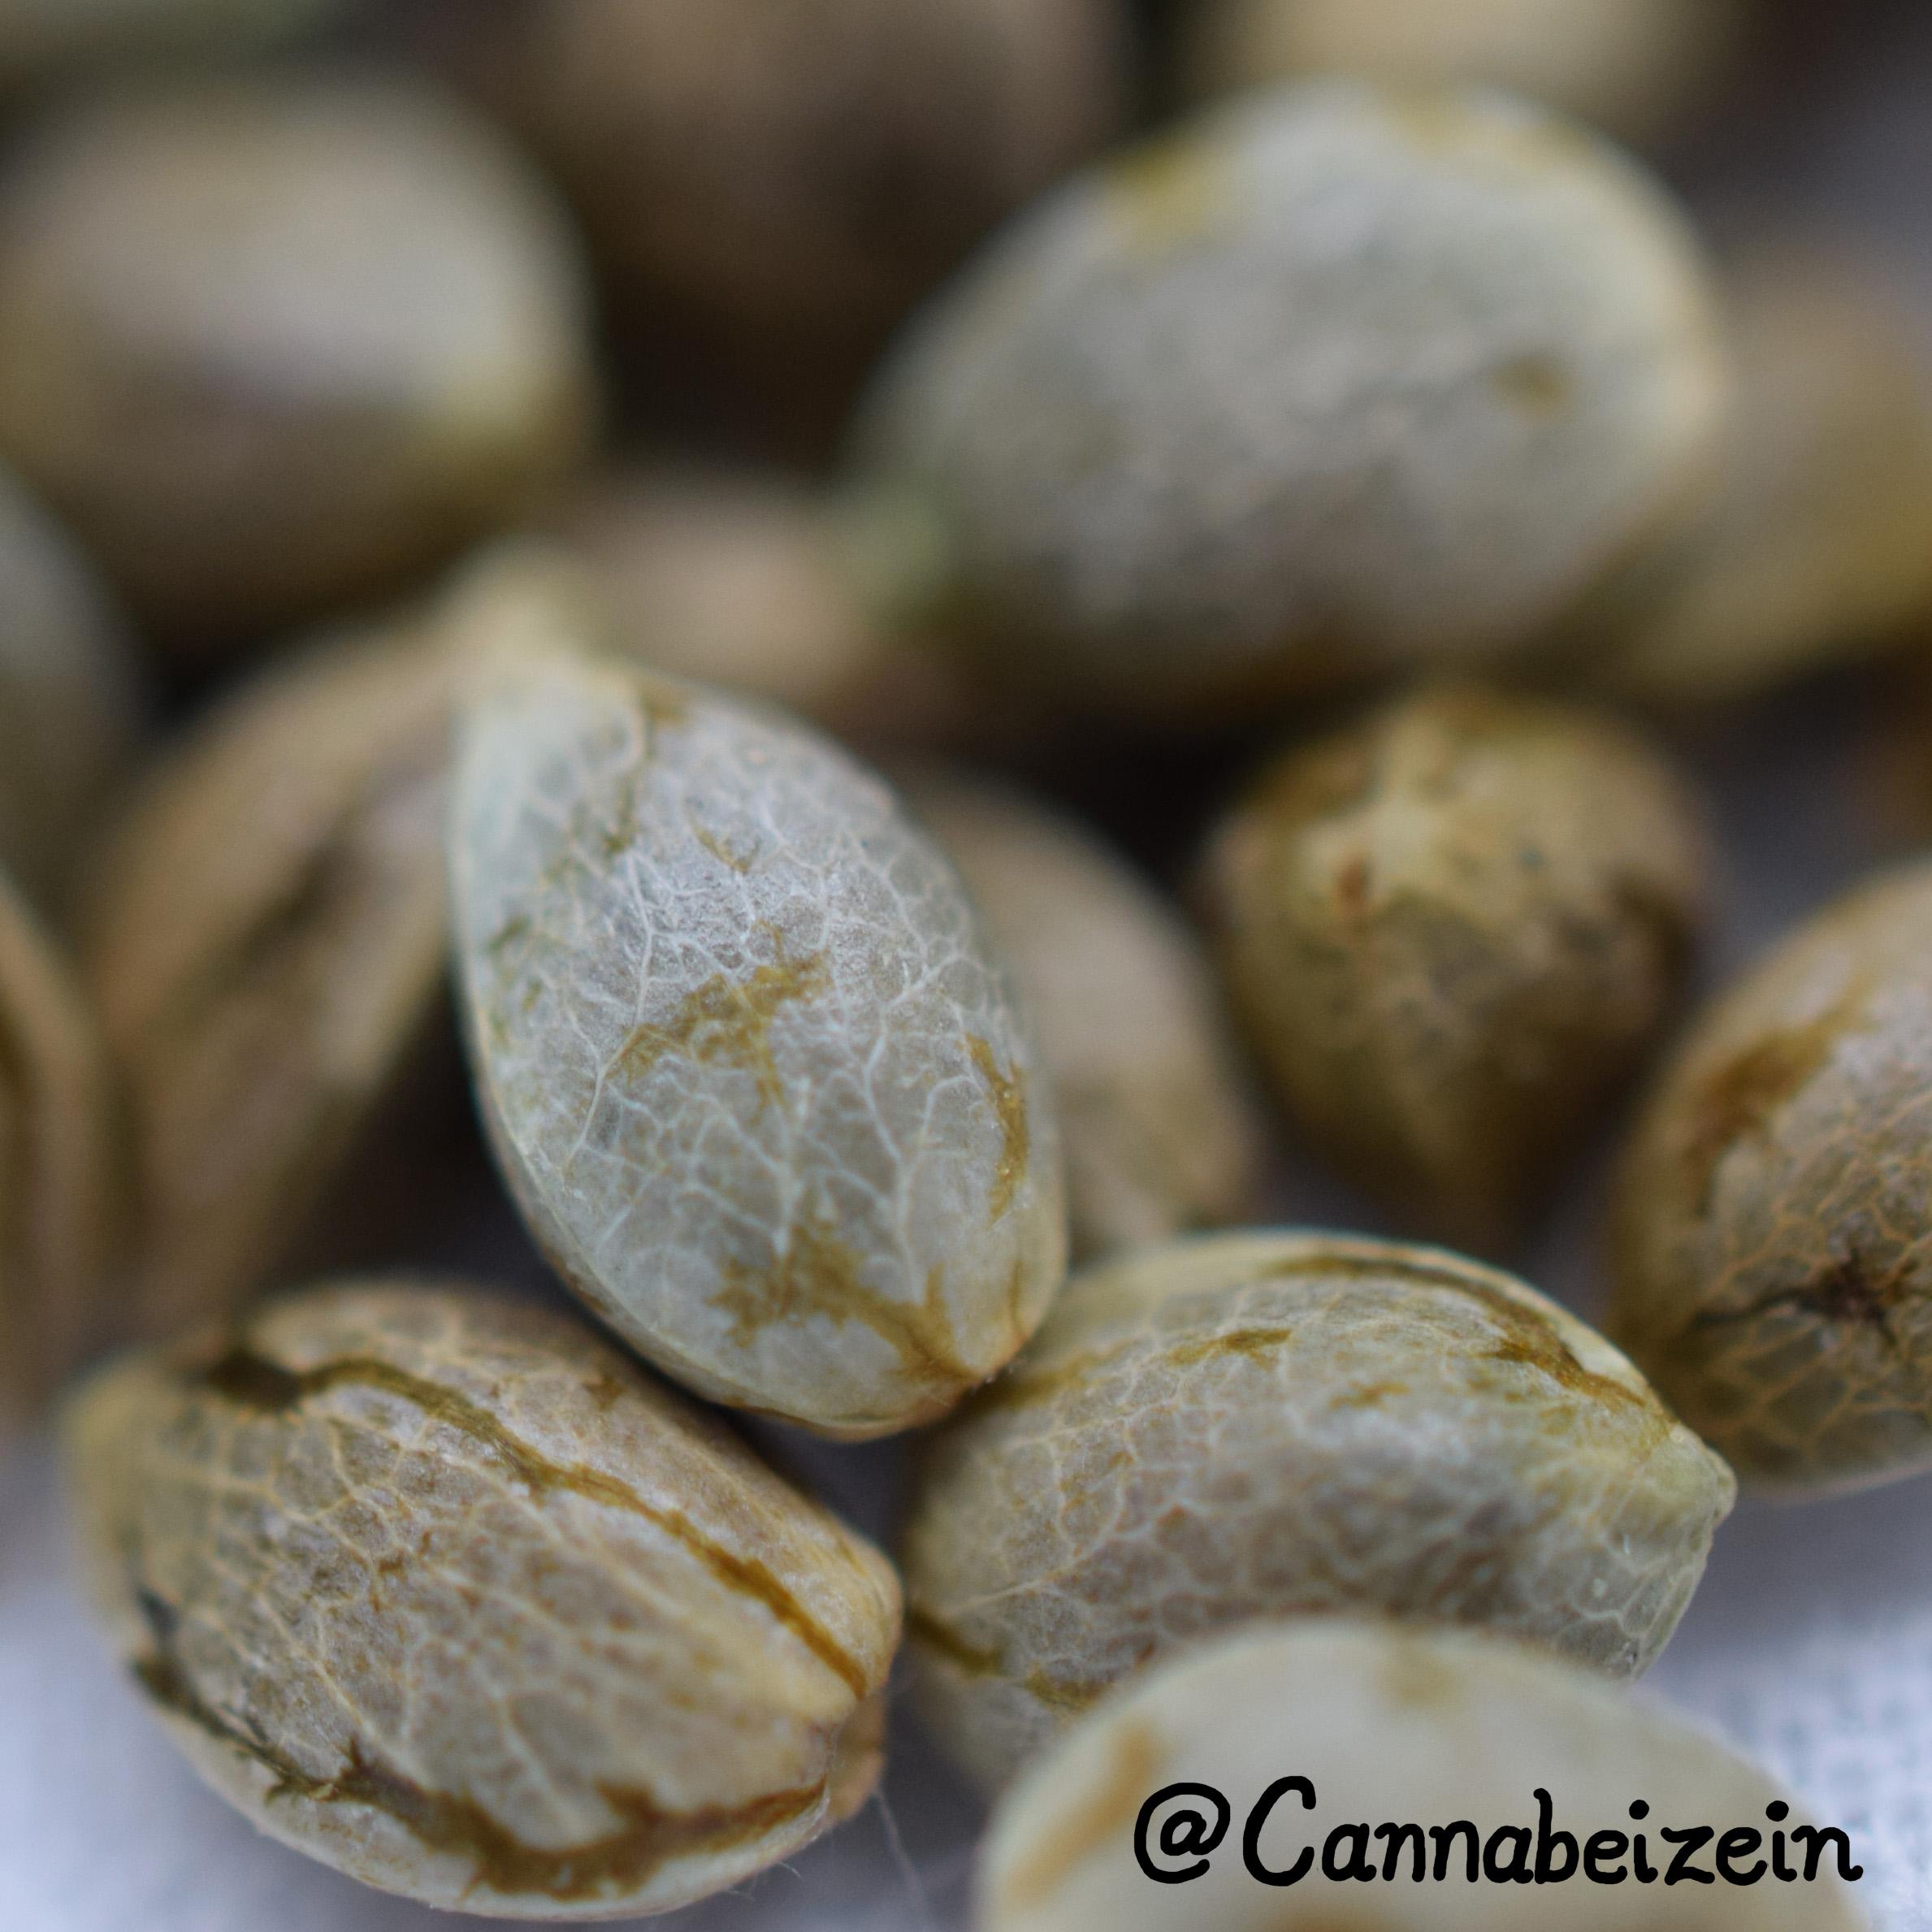 Cannabeizein 0237 - Mystery Mix Seeds - DSC_0834 copy.jpg